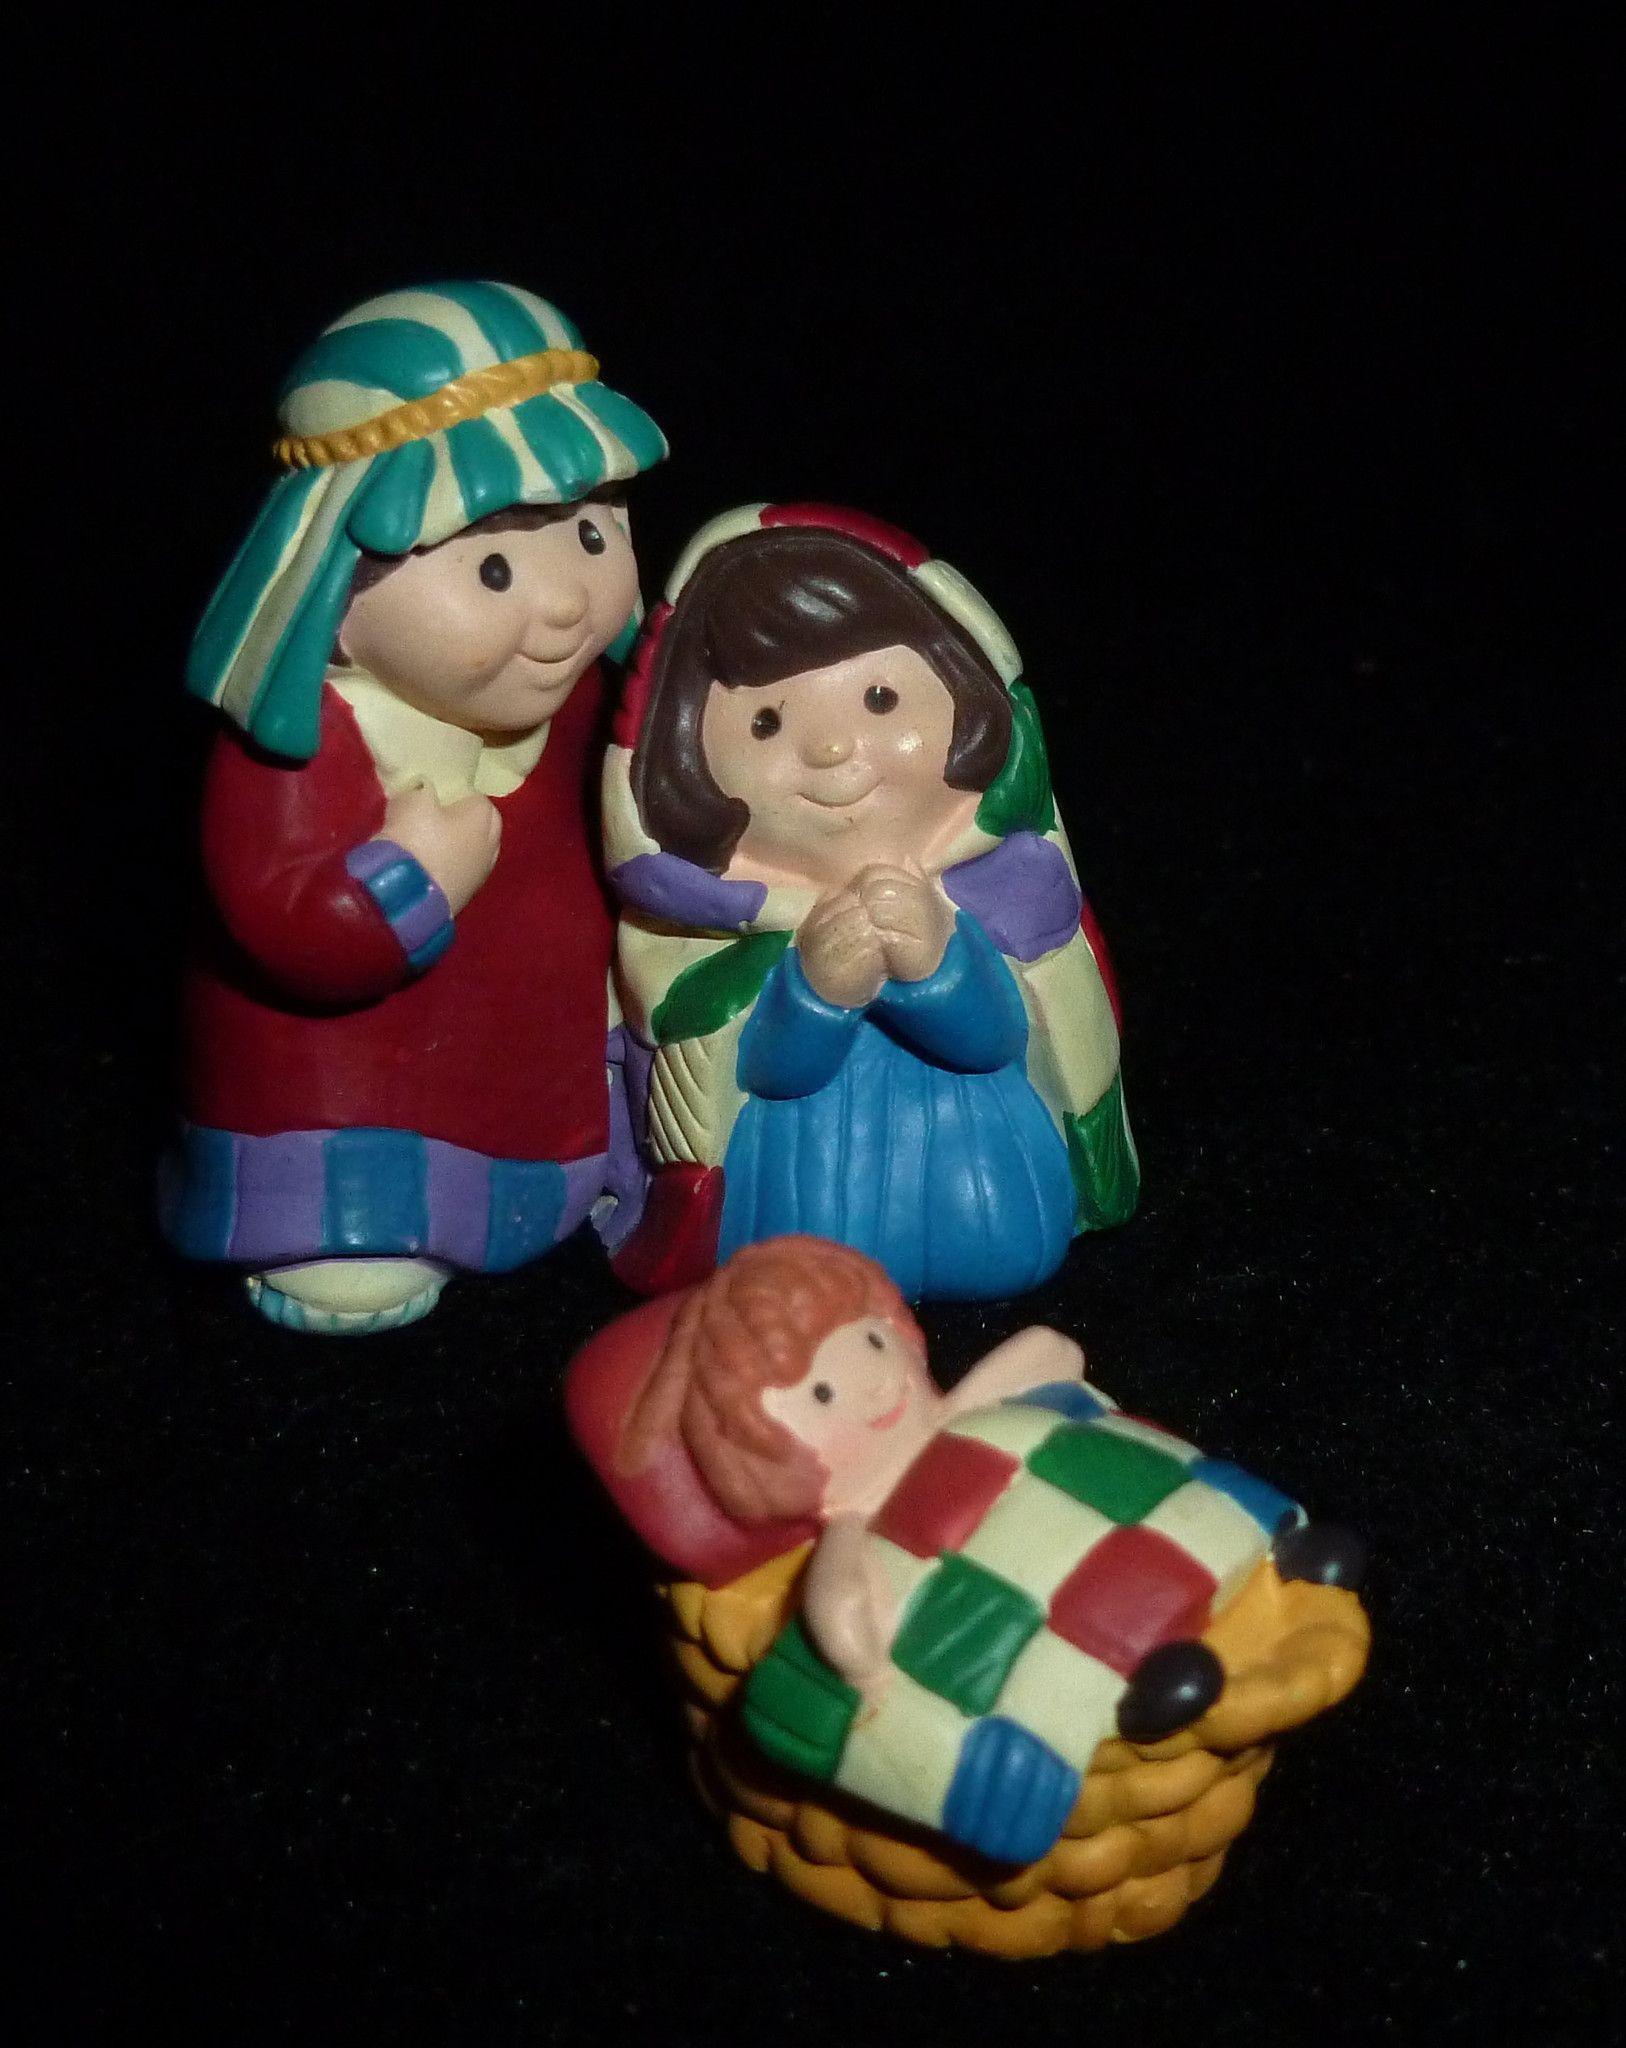 Hallmark Merry Miniature Nativity Set of Figurines